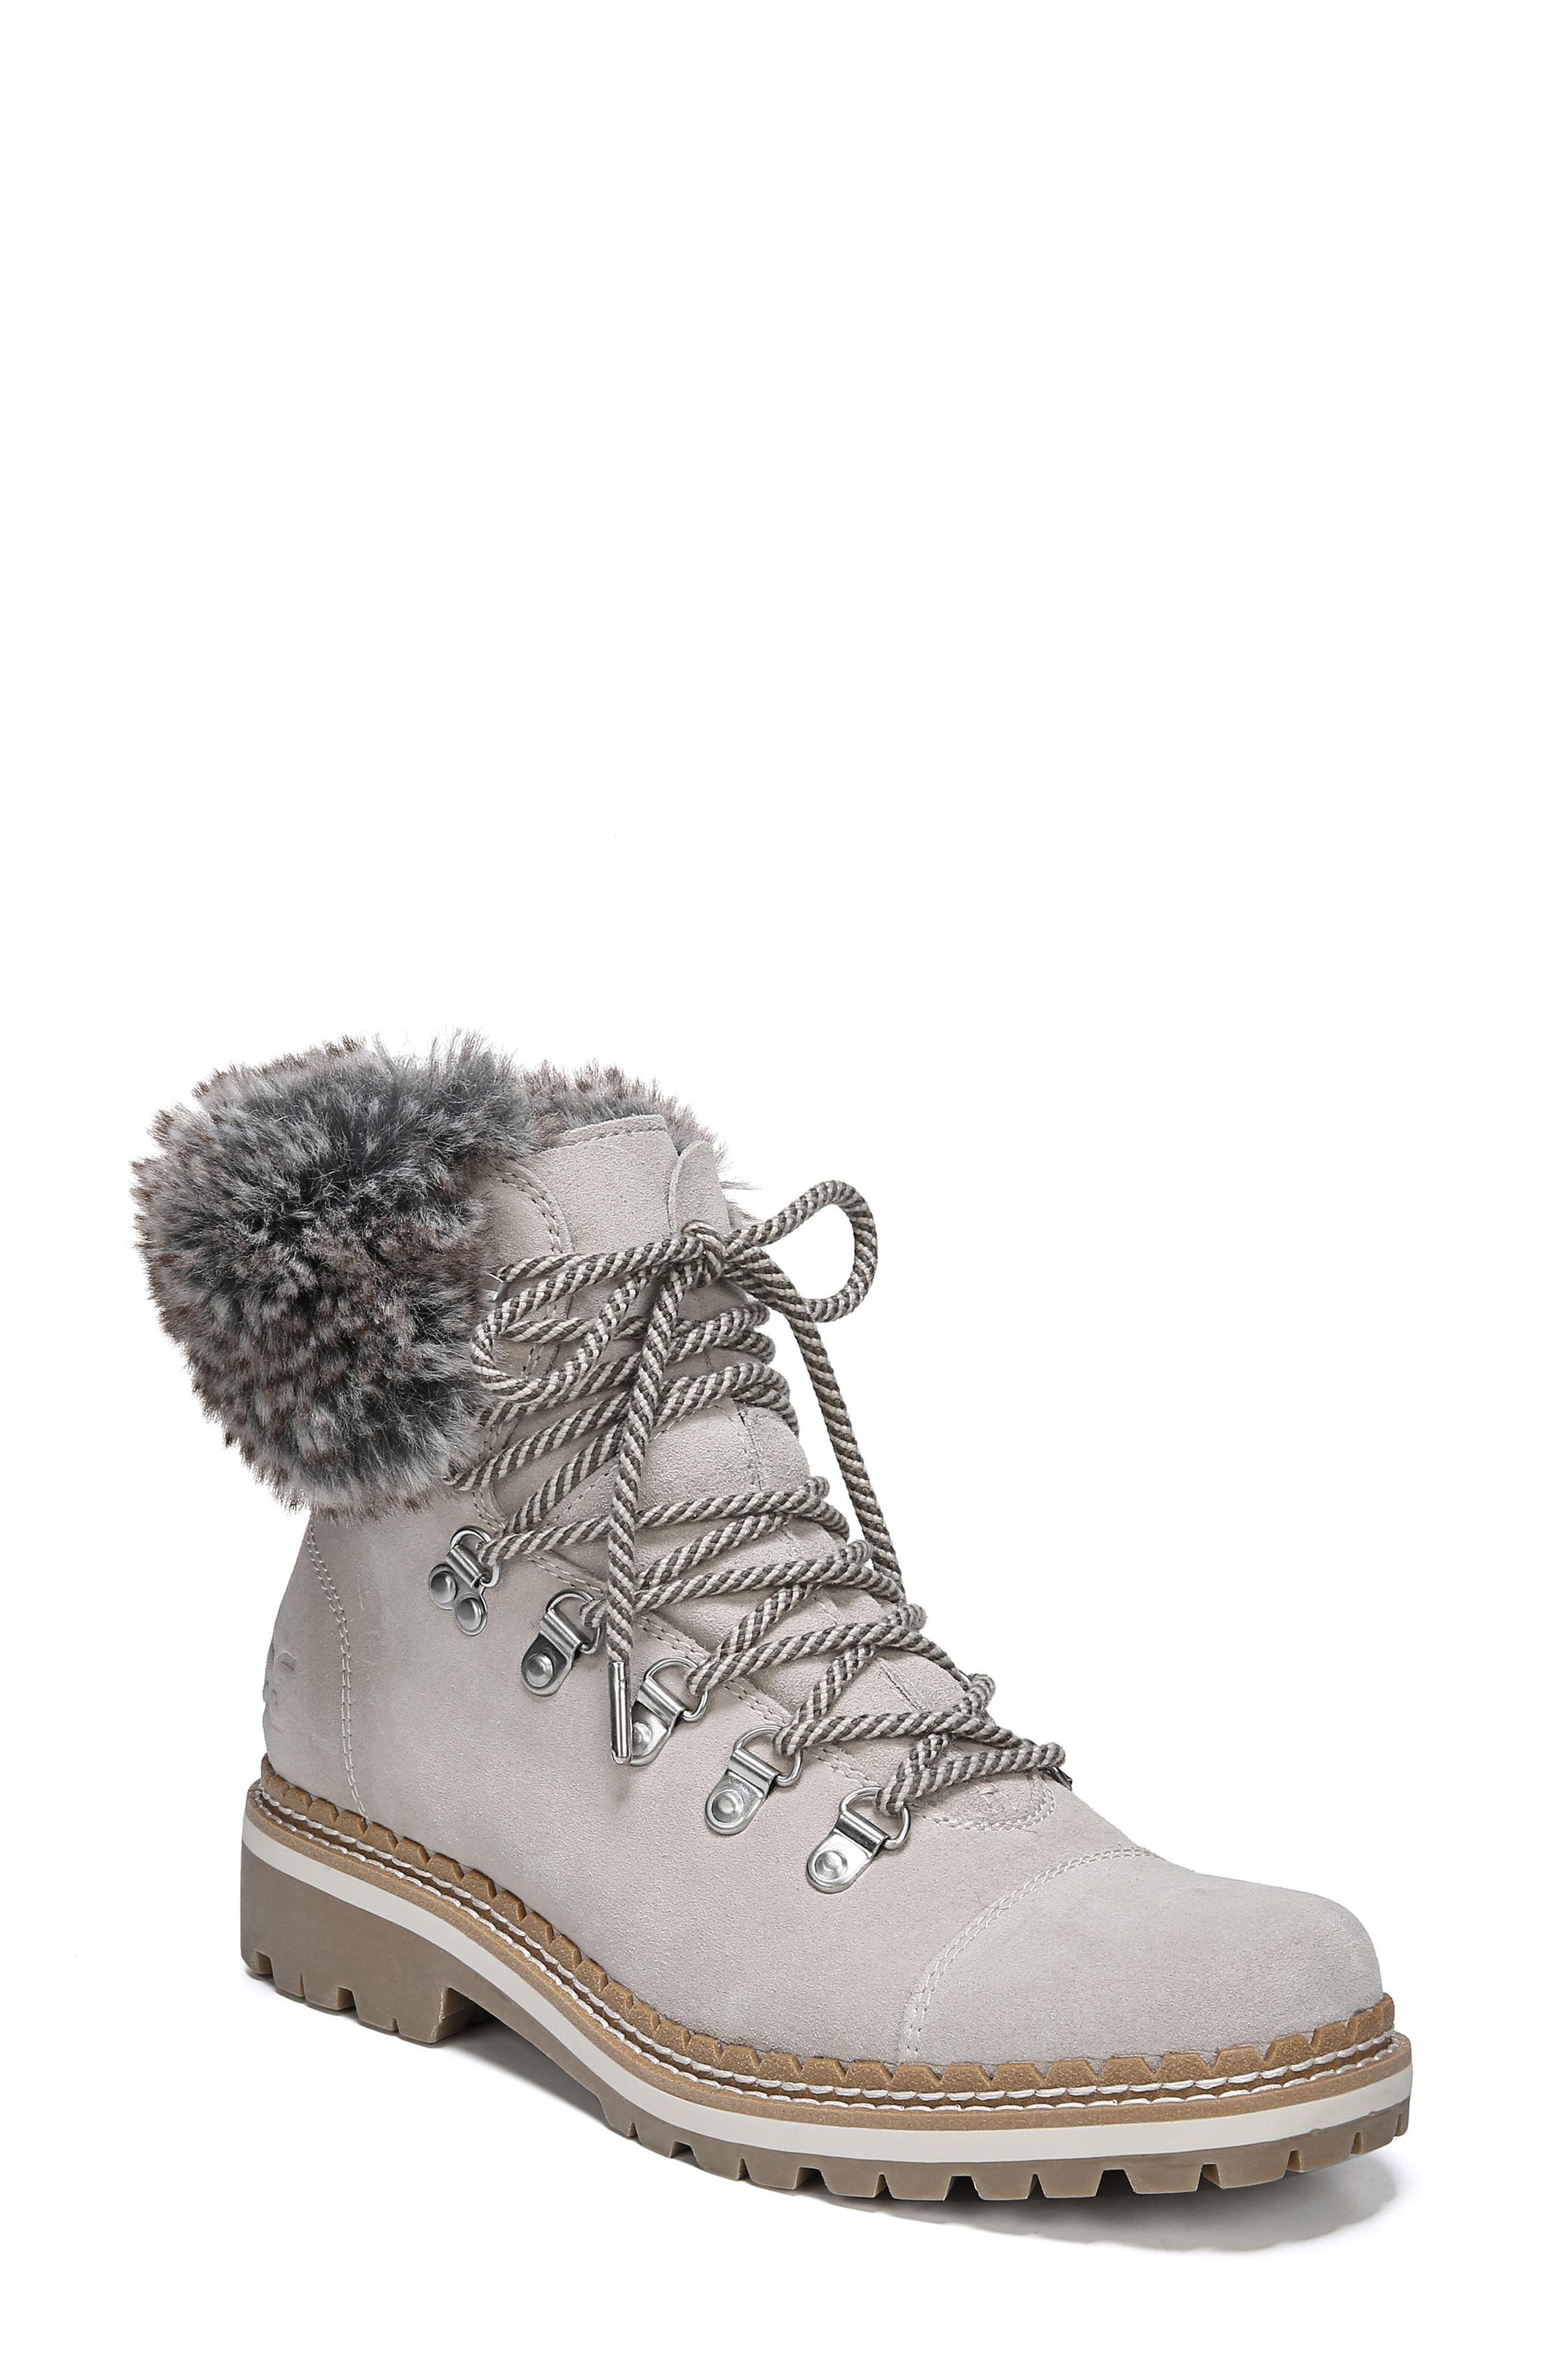 f83728f6aae9 Lyst - Sam Edelman Bowen Faux Fur Trim Bootie - Save 18%